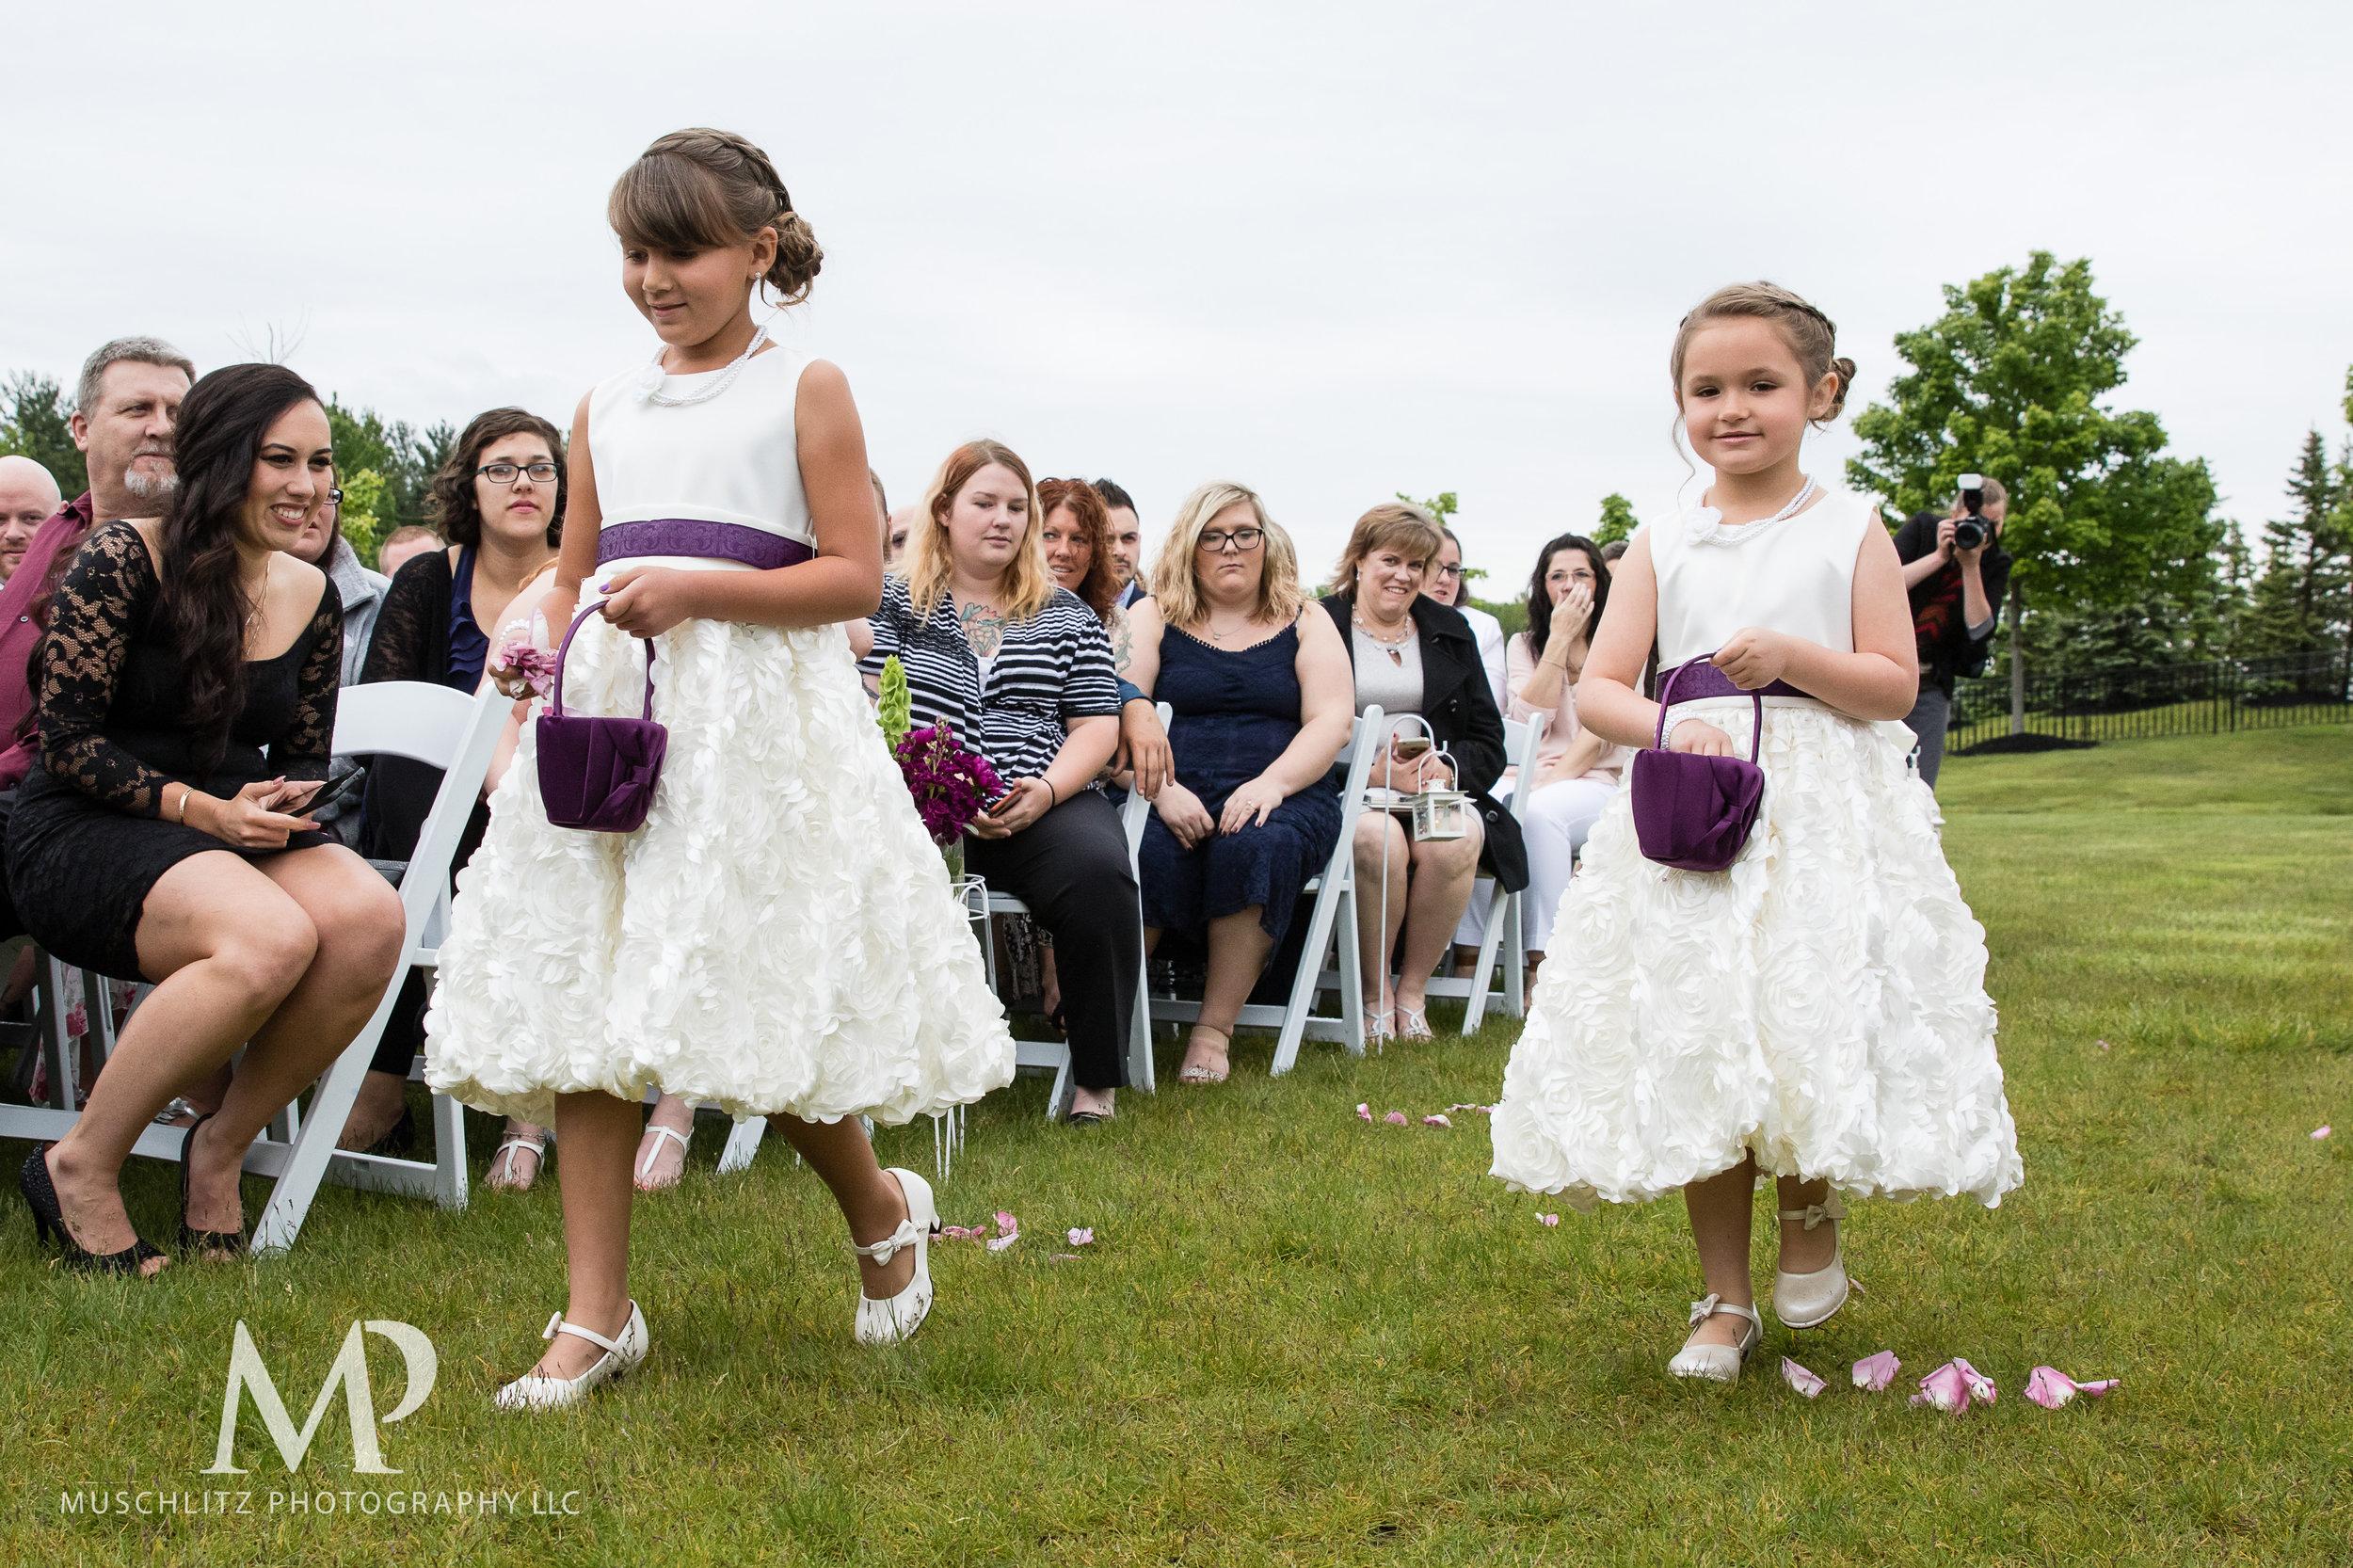 club-at-corazon-wedding-ceremony-reception-columbus-dublin-ohio-ohio-university-theme-027.JPG